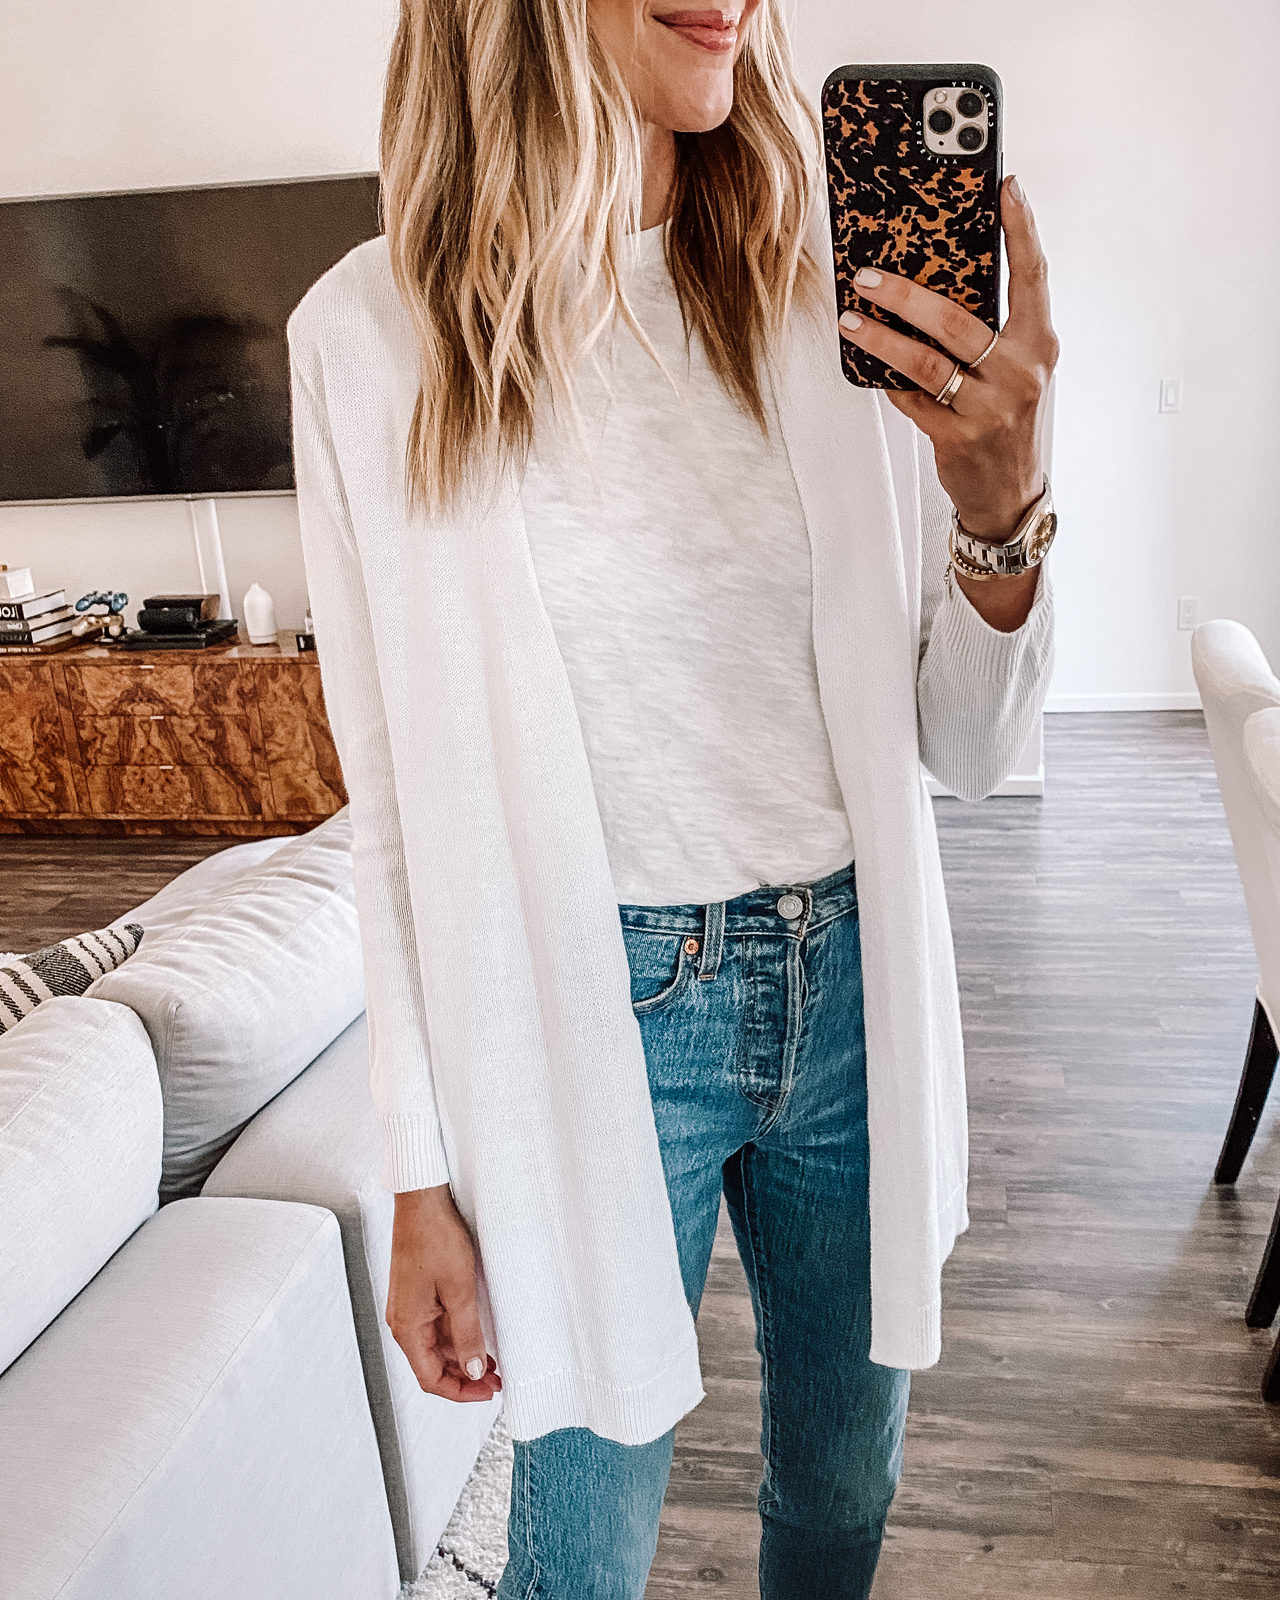 Fashion Jackson Wearing White Cardigan White Tshirt Levis Jeans